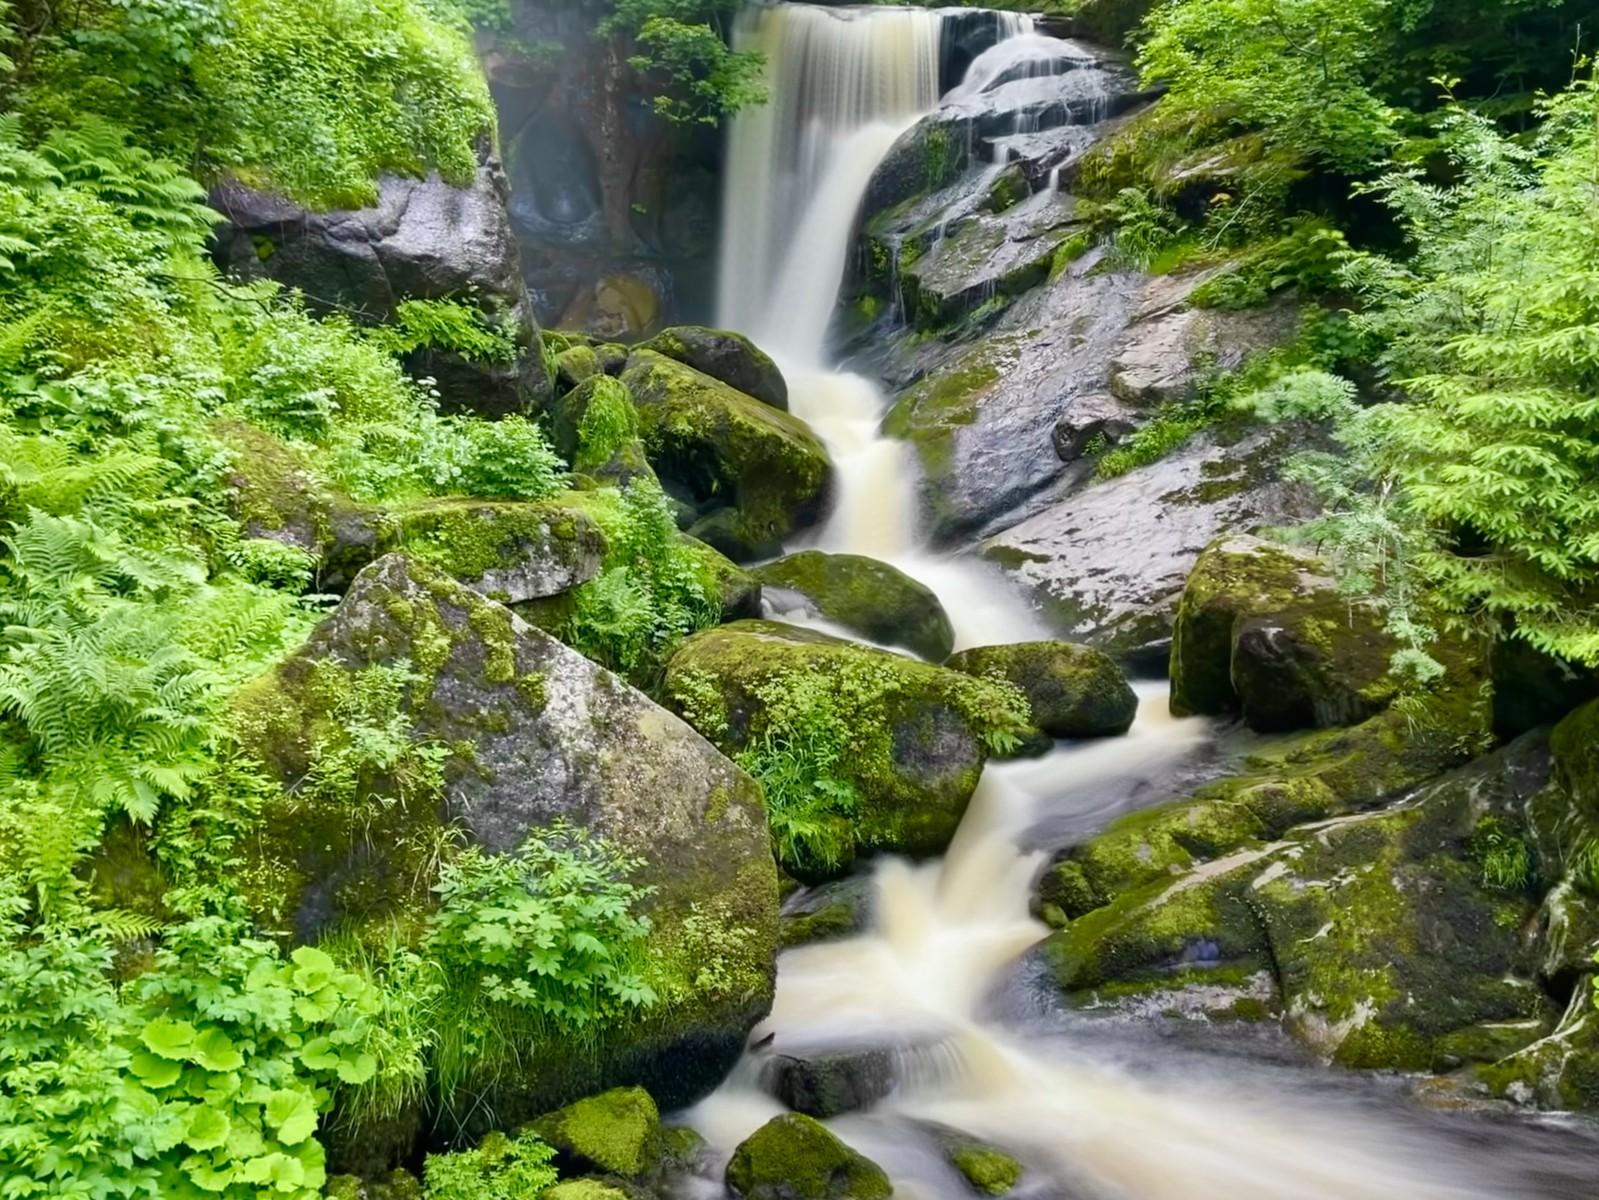 Triberg Waterfall, Triberg, Germany